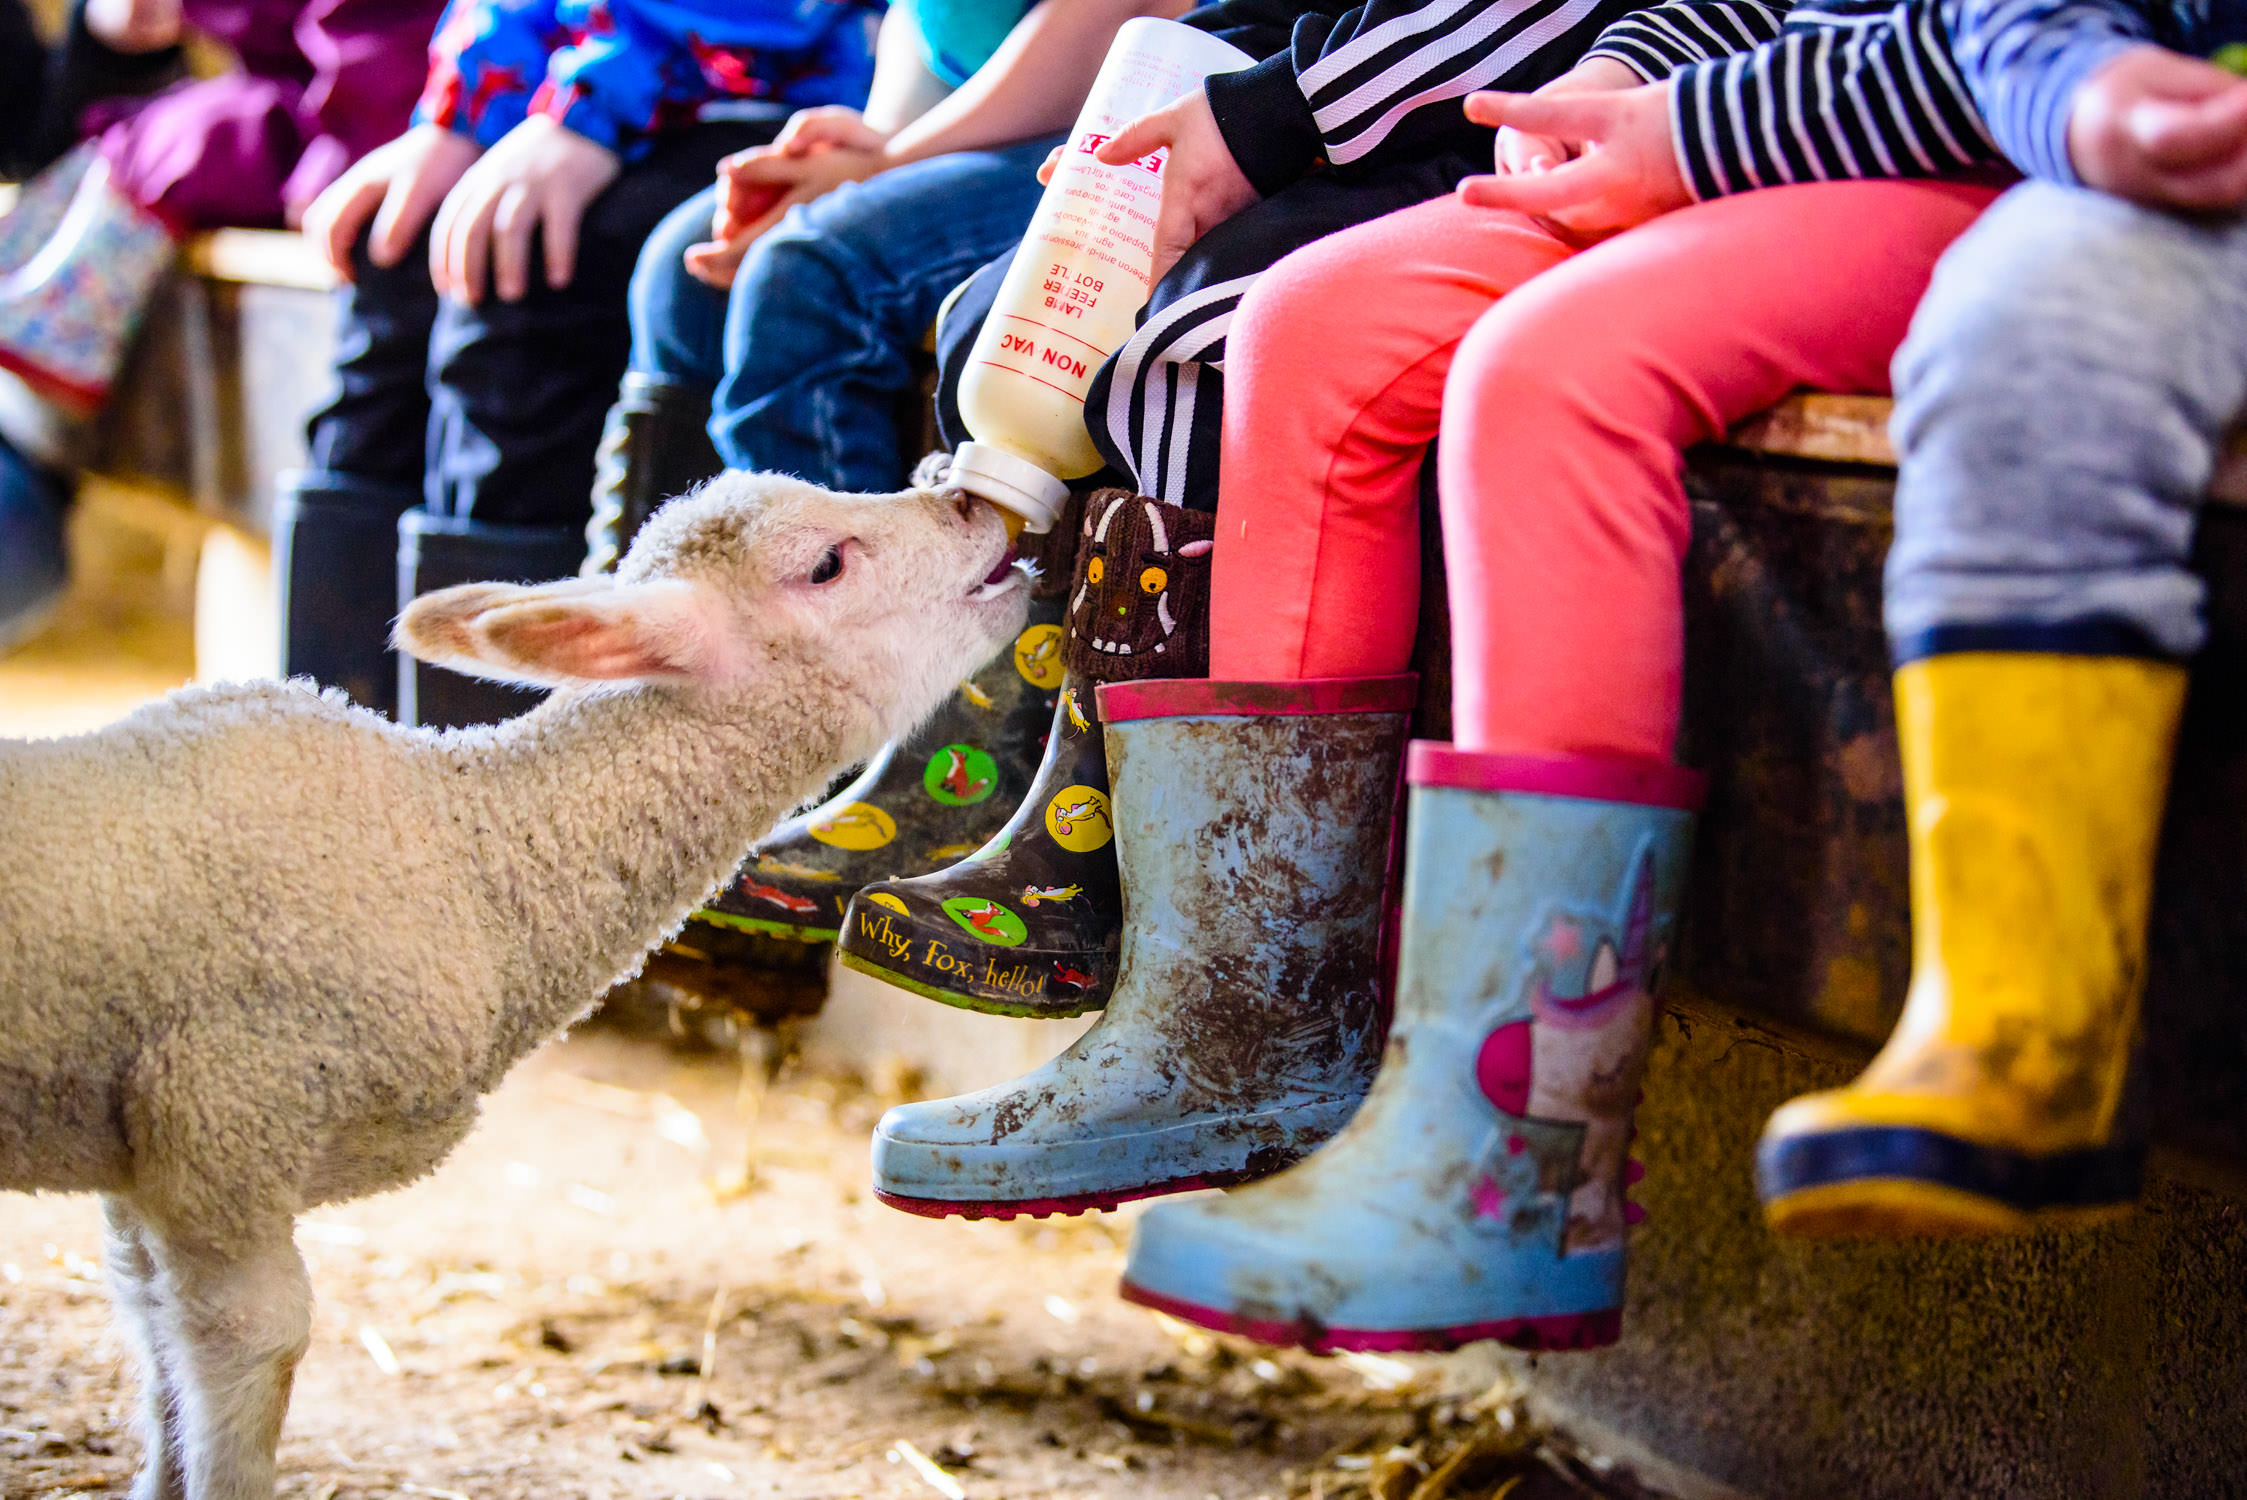 Children feeding a lamb